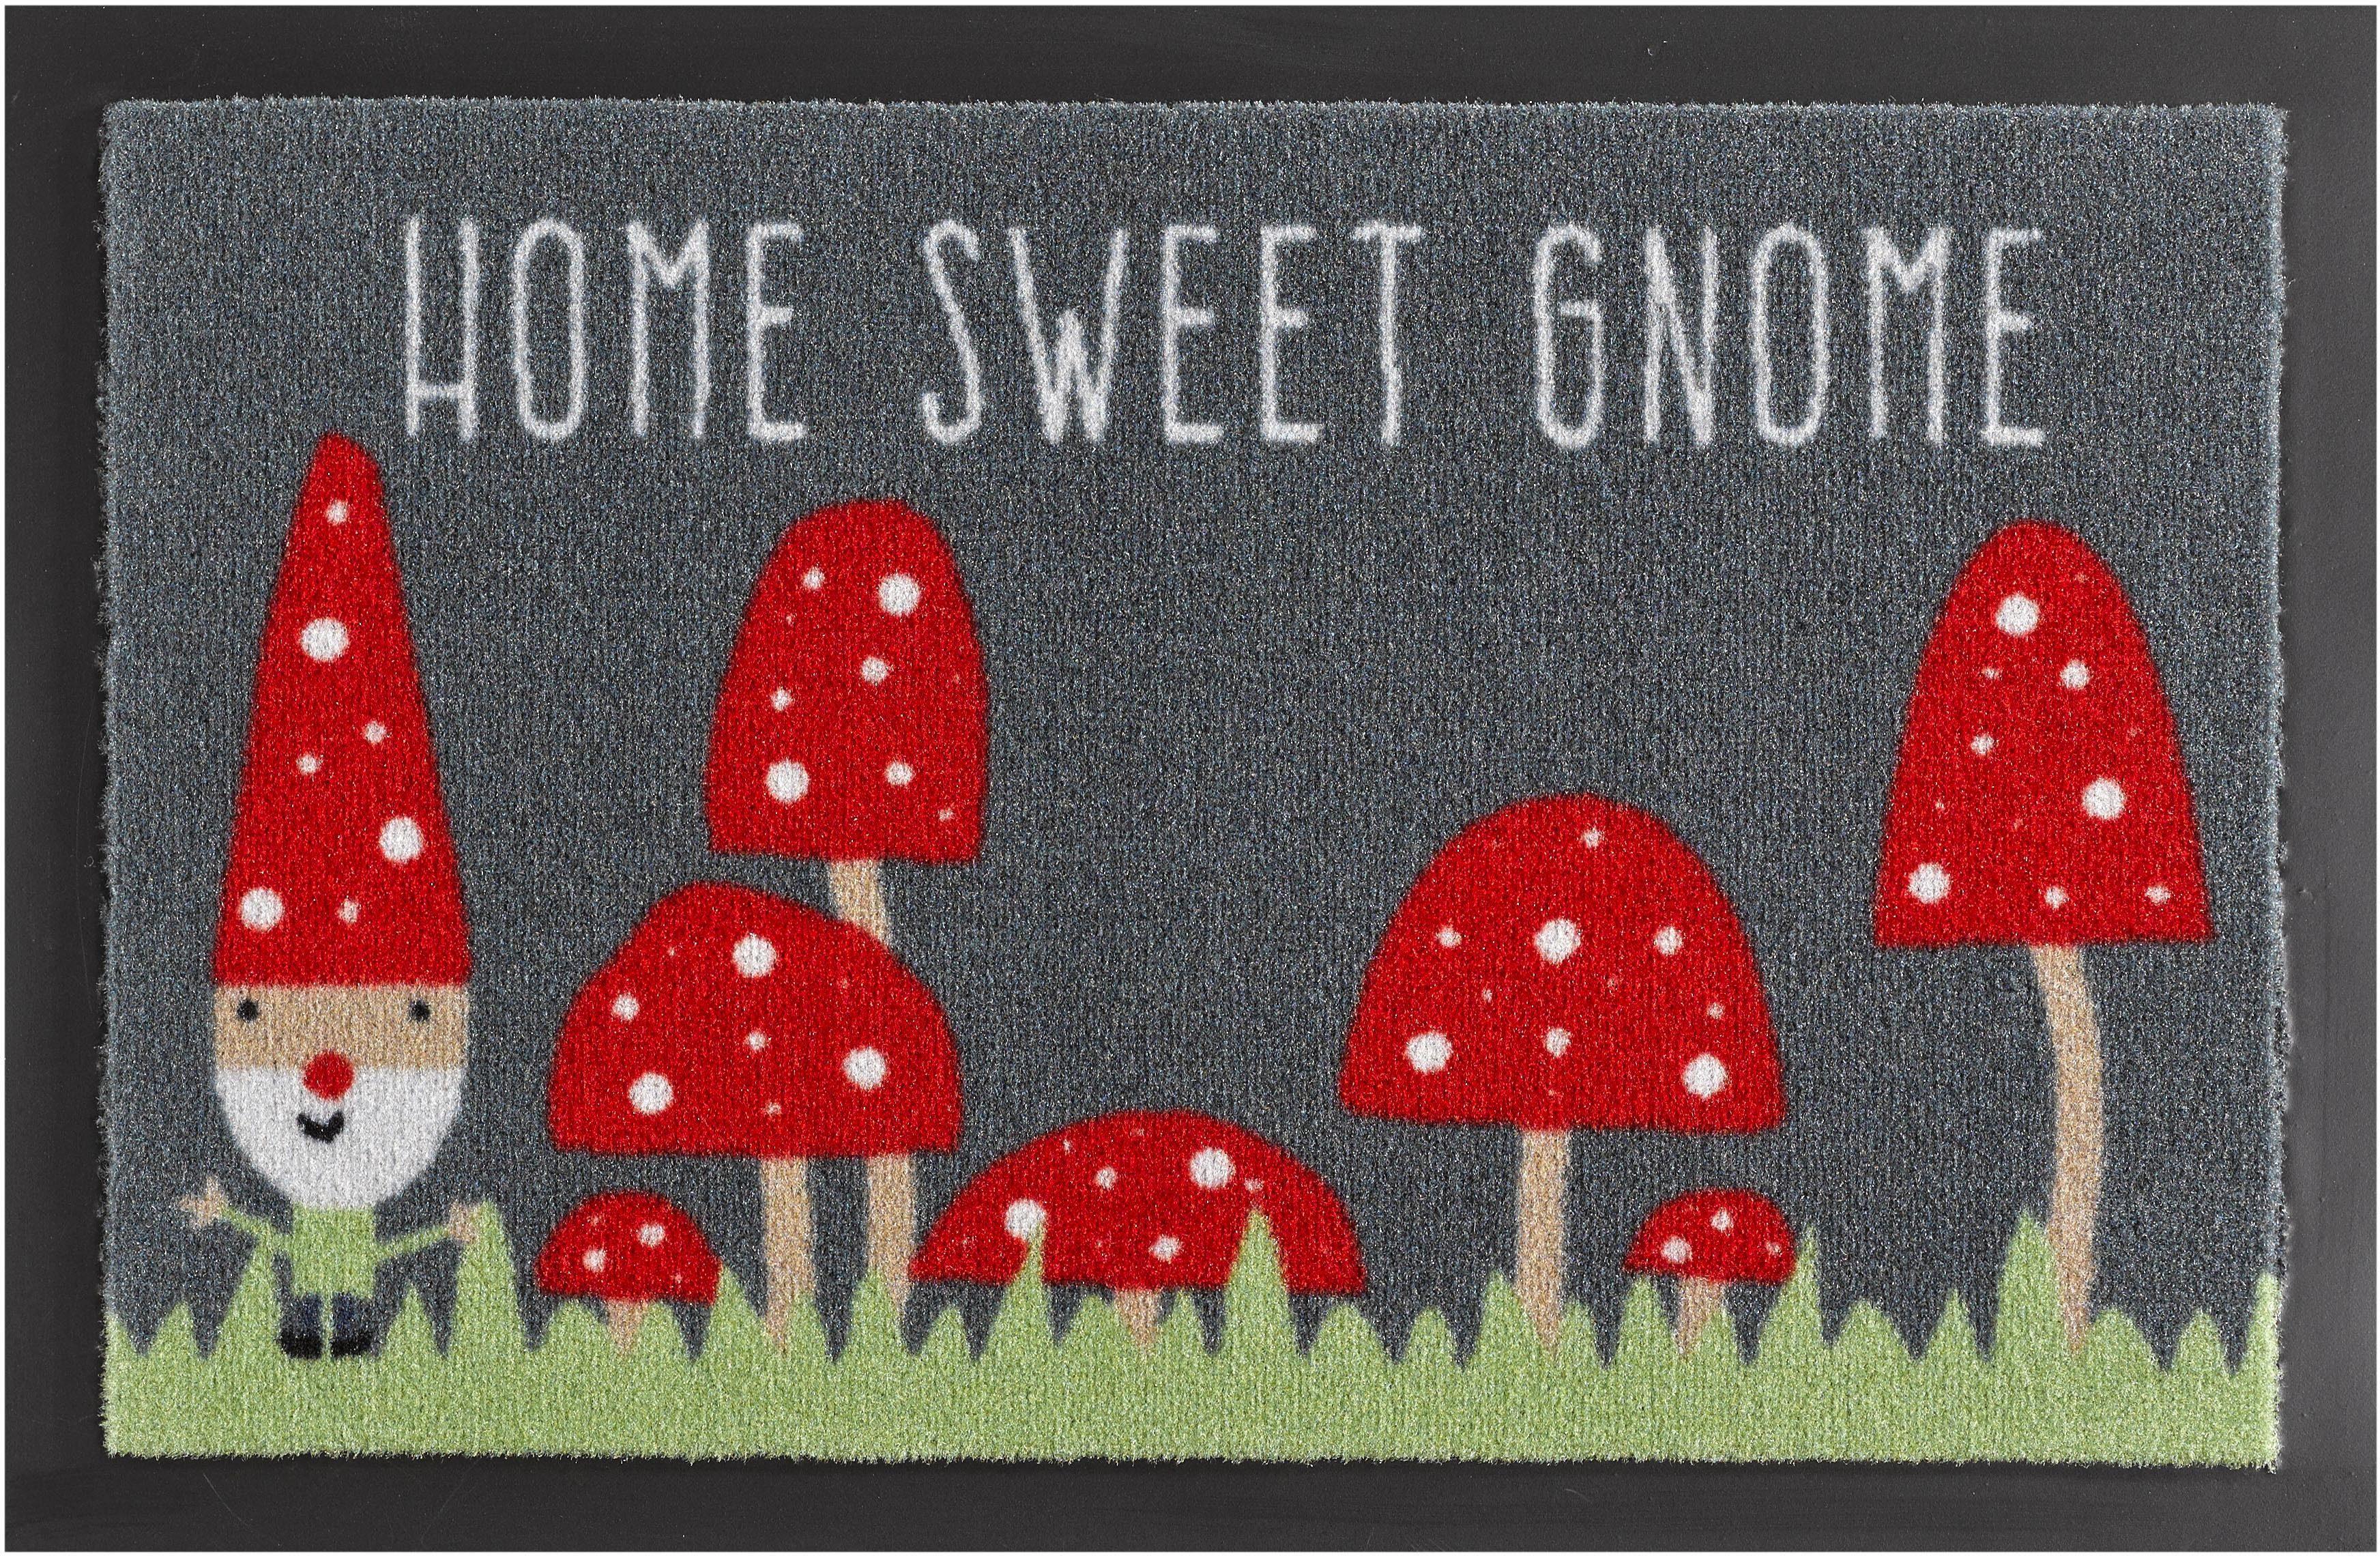 Fußmatte »Home Sweet Gnome«, Hanse Home, rechteckig, Höhe 7 mm, rutschhemmend beschichtet